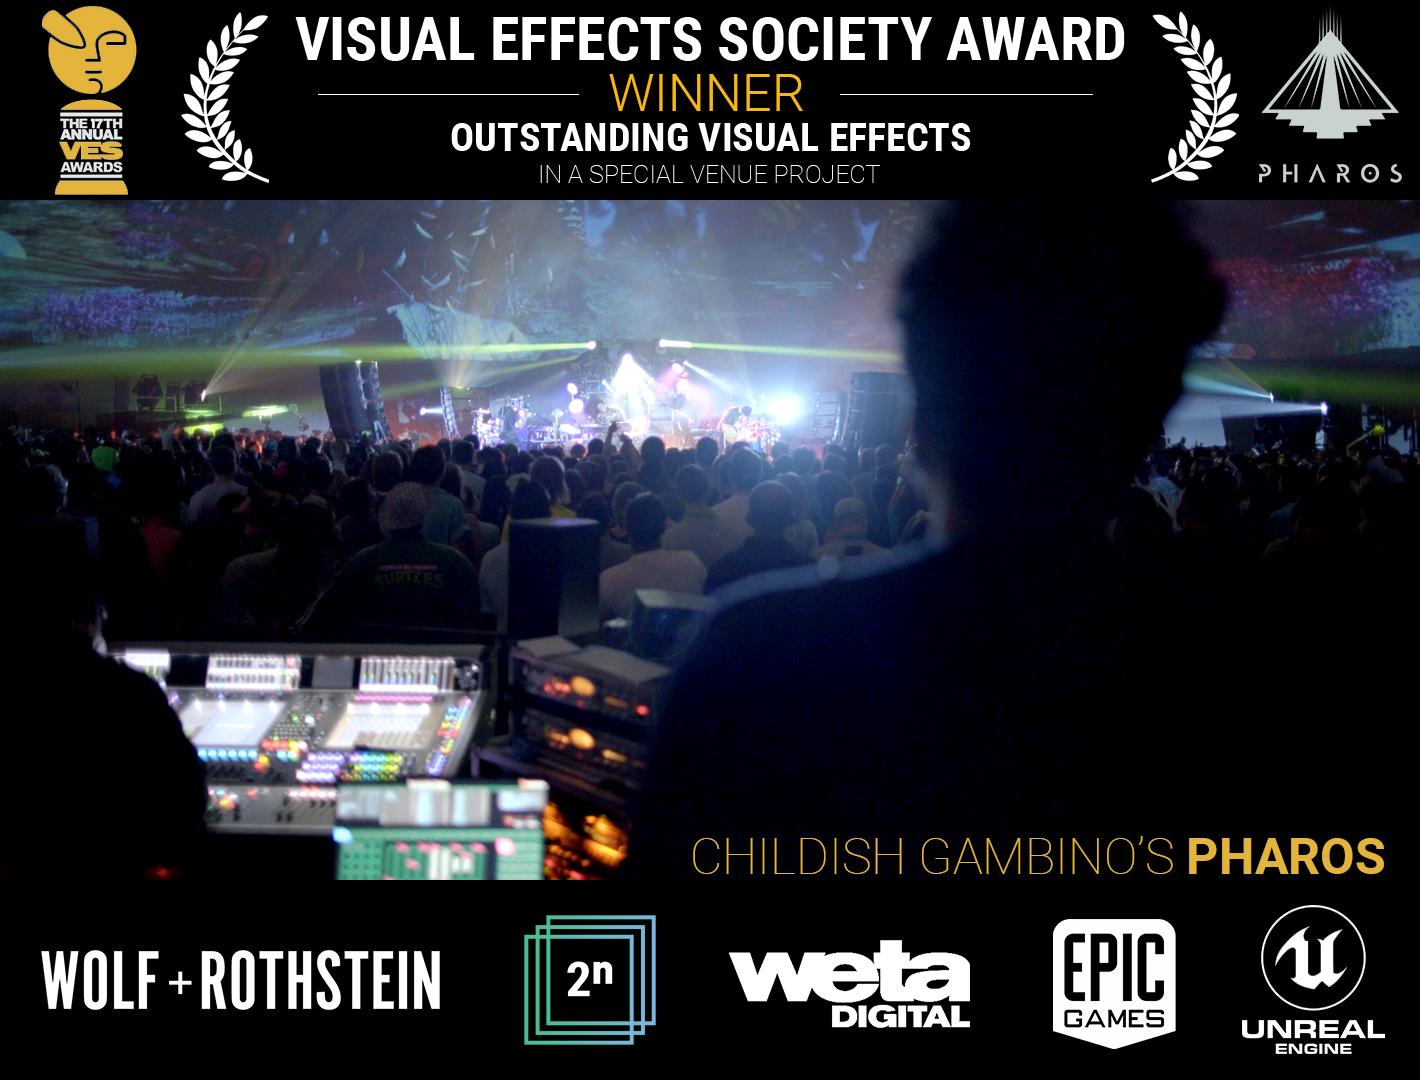 VES Award Winner